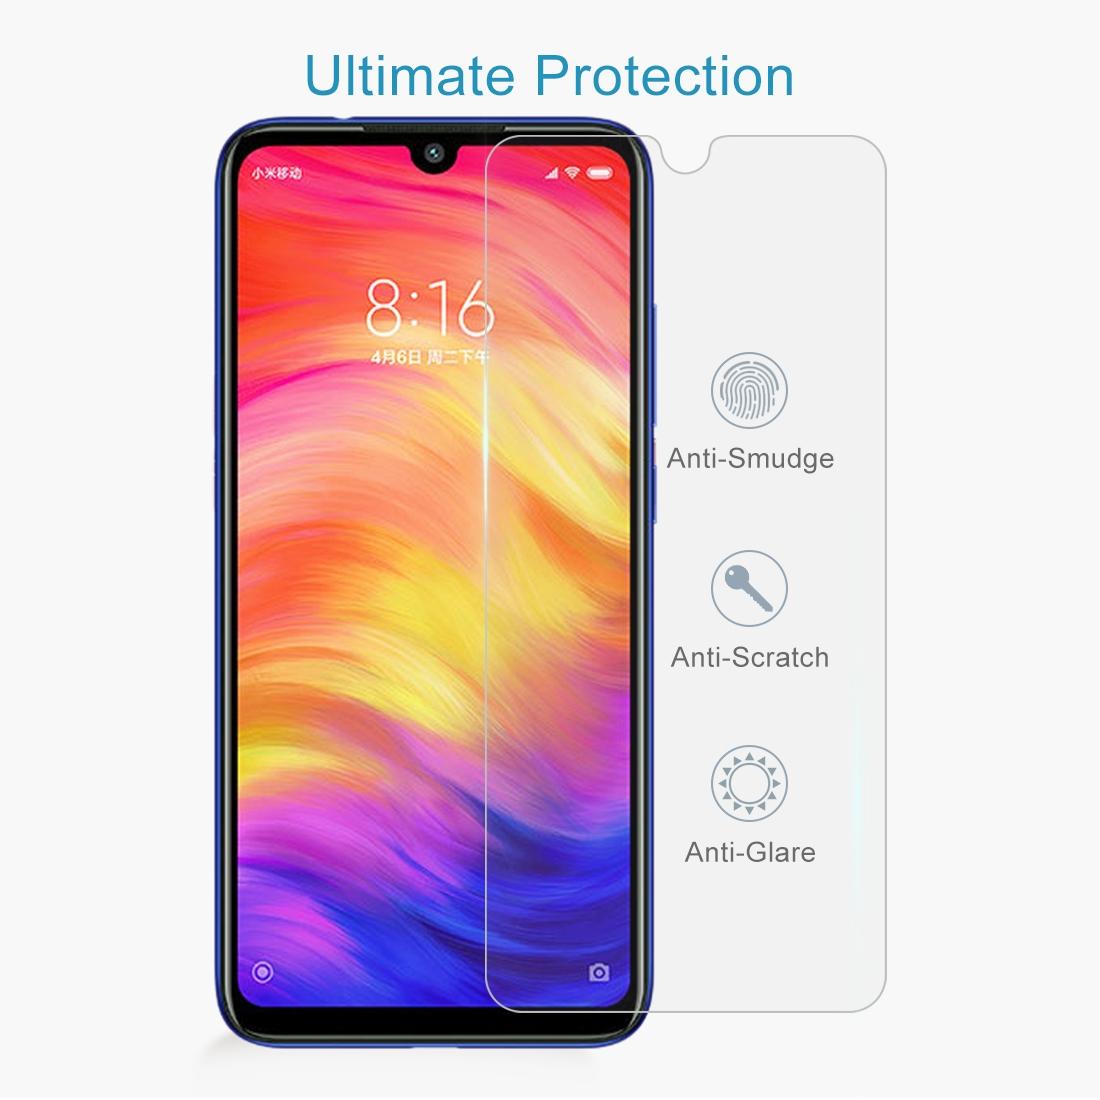 full-glass-lcd-protector-xiaomi-redmi7-محافظ-صفحه-نمایش-فول-گلس_تمام-چسب-شیائومی-ردمی-سون.jpg